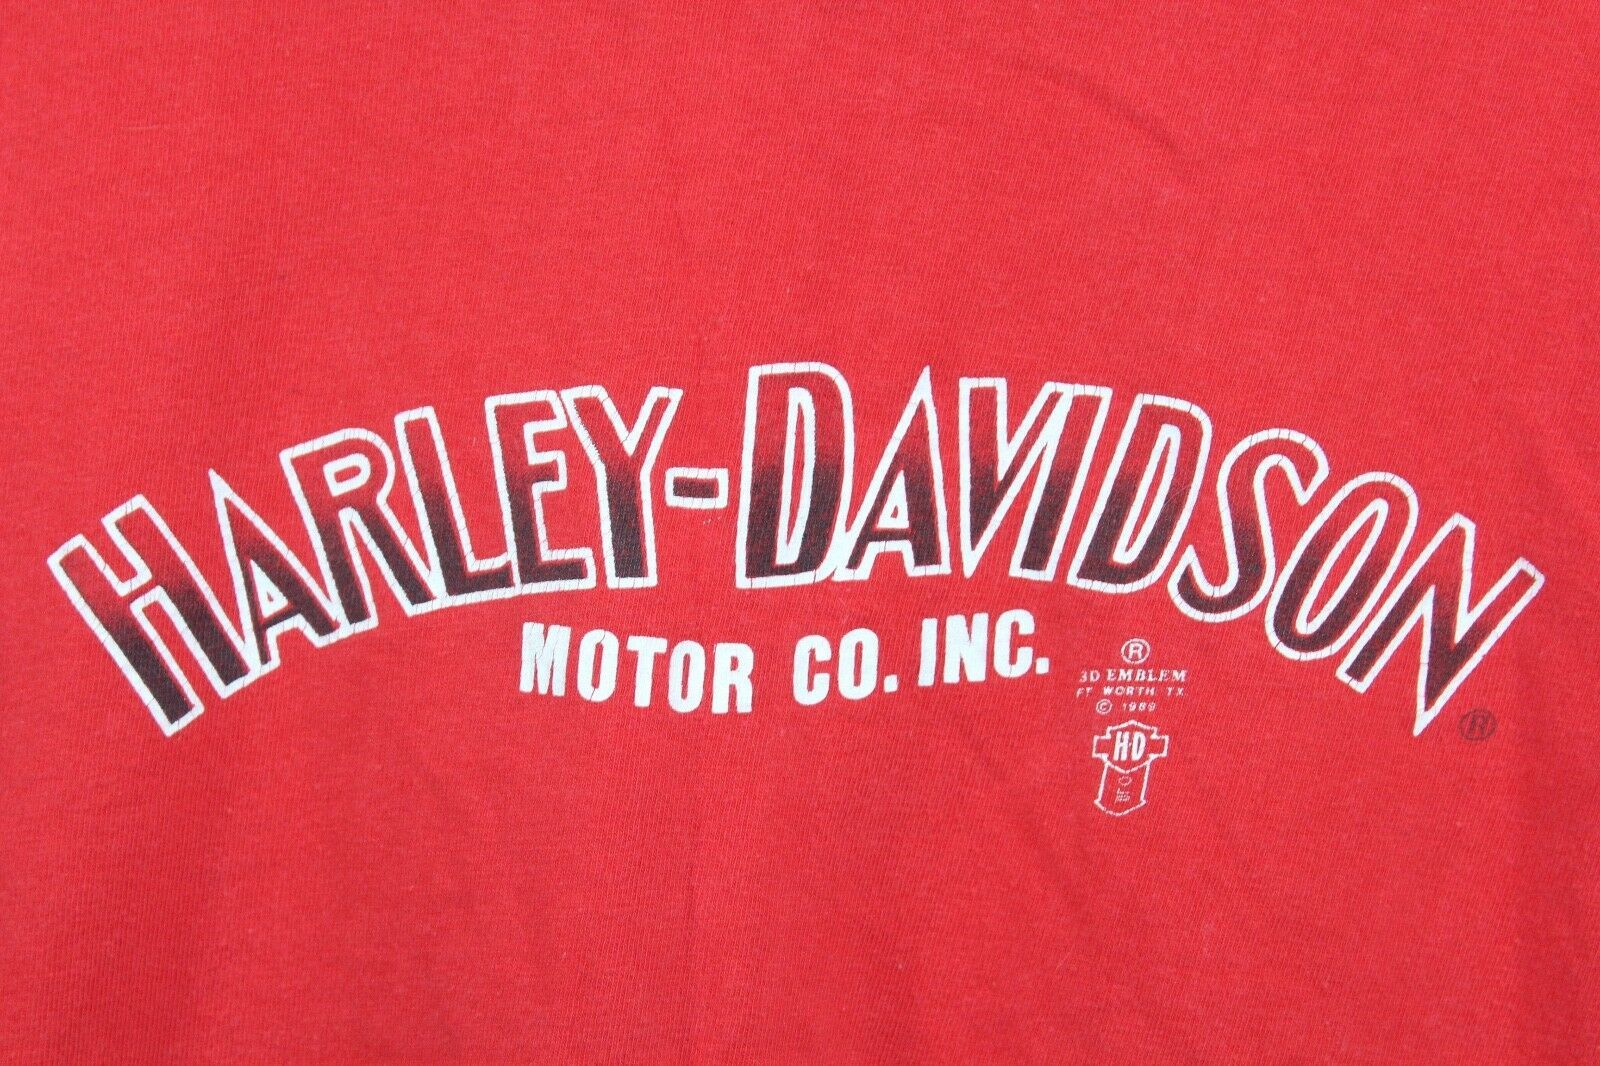 Vintage 80s 3D Emblème Homme Petit Harley Davidson Detroit Chemise Rouge image 2